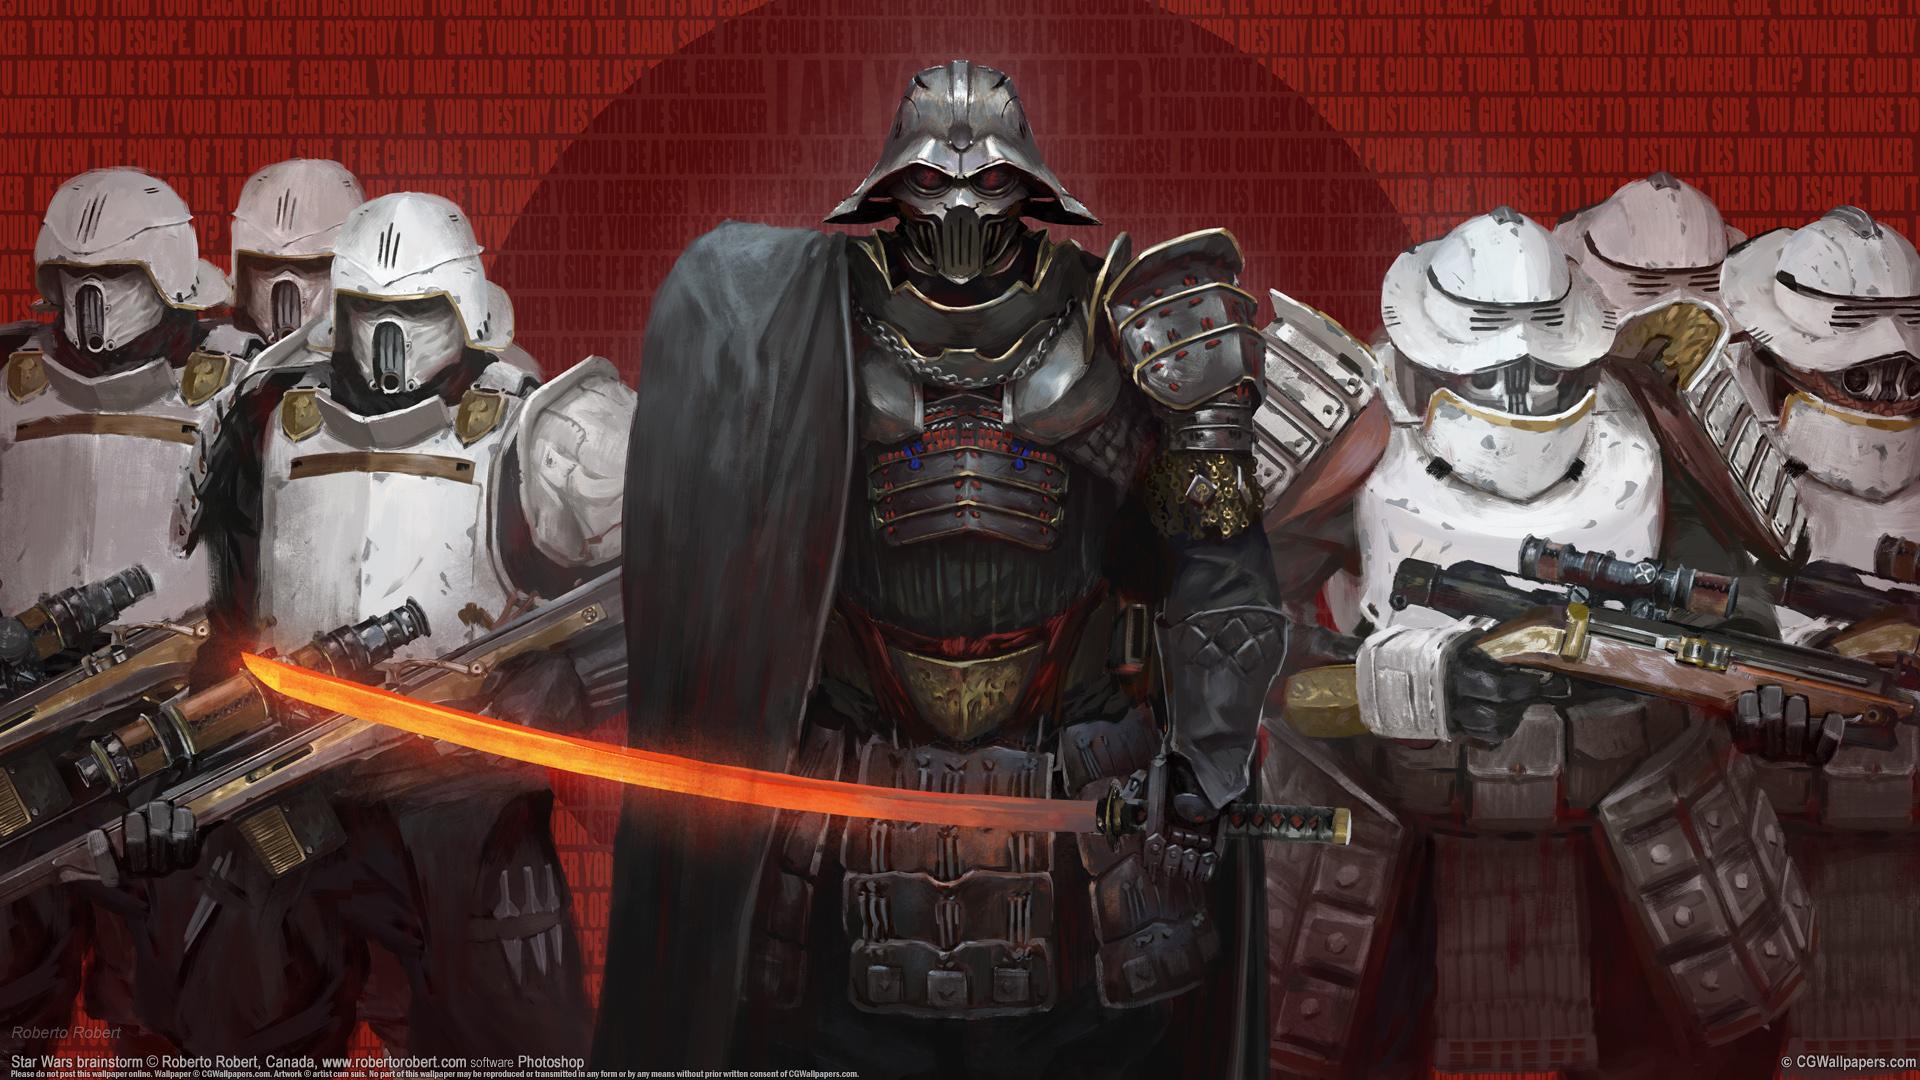 3440x1440 Wallpaper Star Wars: Roberto Robert Wallpaper Star Wars Brainstorm 1920x1080